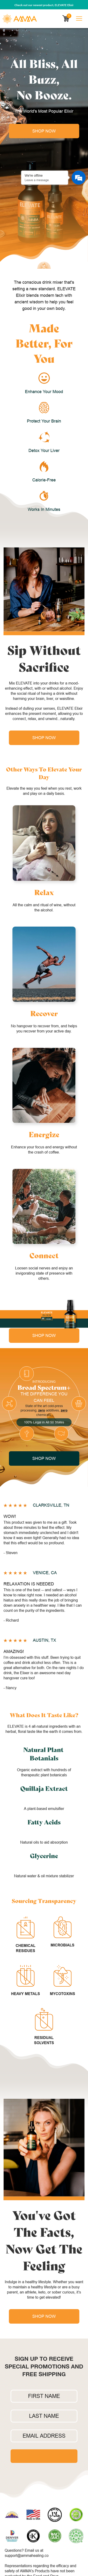 Example of Design for Food & Drink, Beverages, Mobile Landing Page by elevateelixir.co | Mobile Landing Page Design